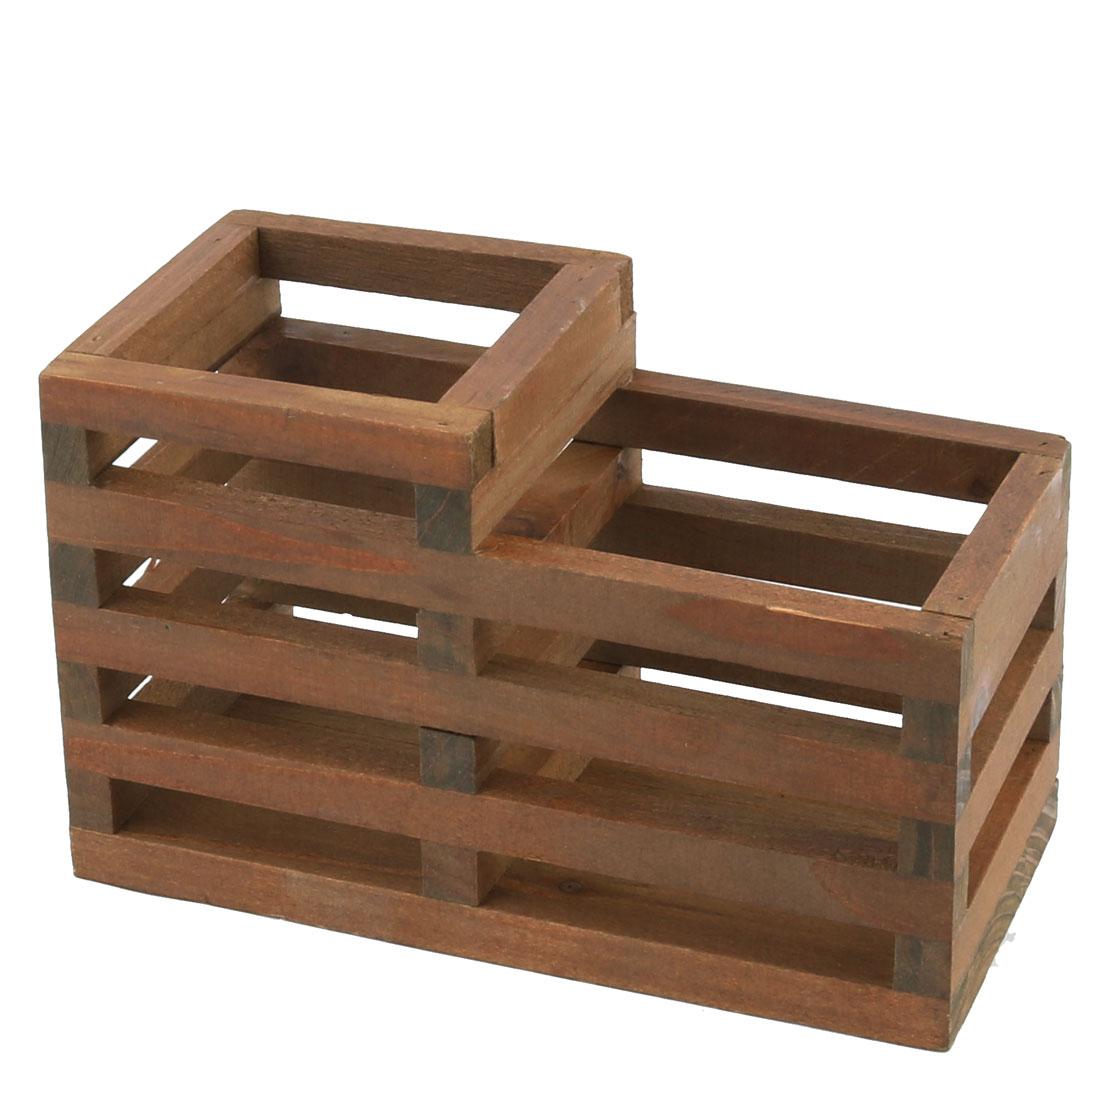 Wooden Hollow Out Design Desktop 2 Compartments Pen Holder Storage Basket